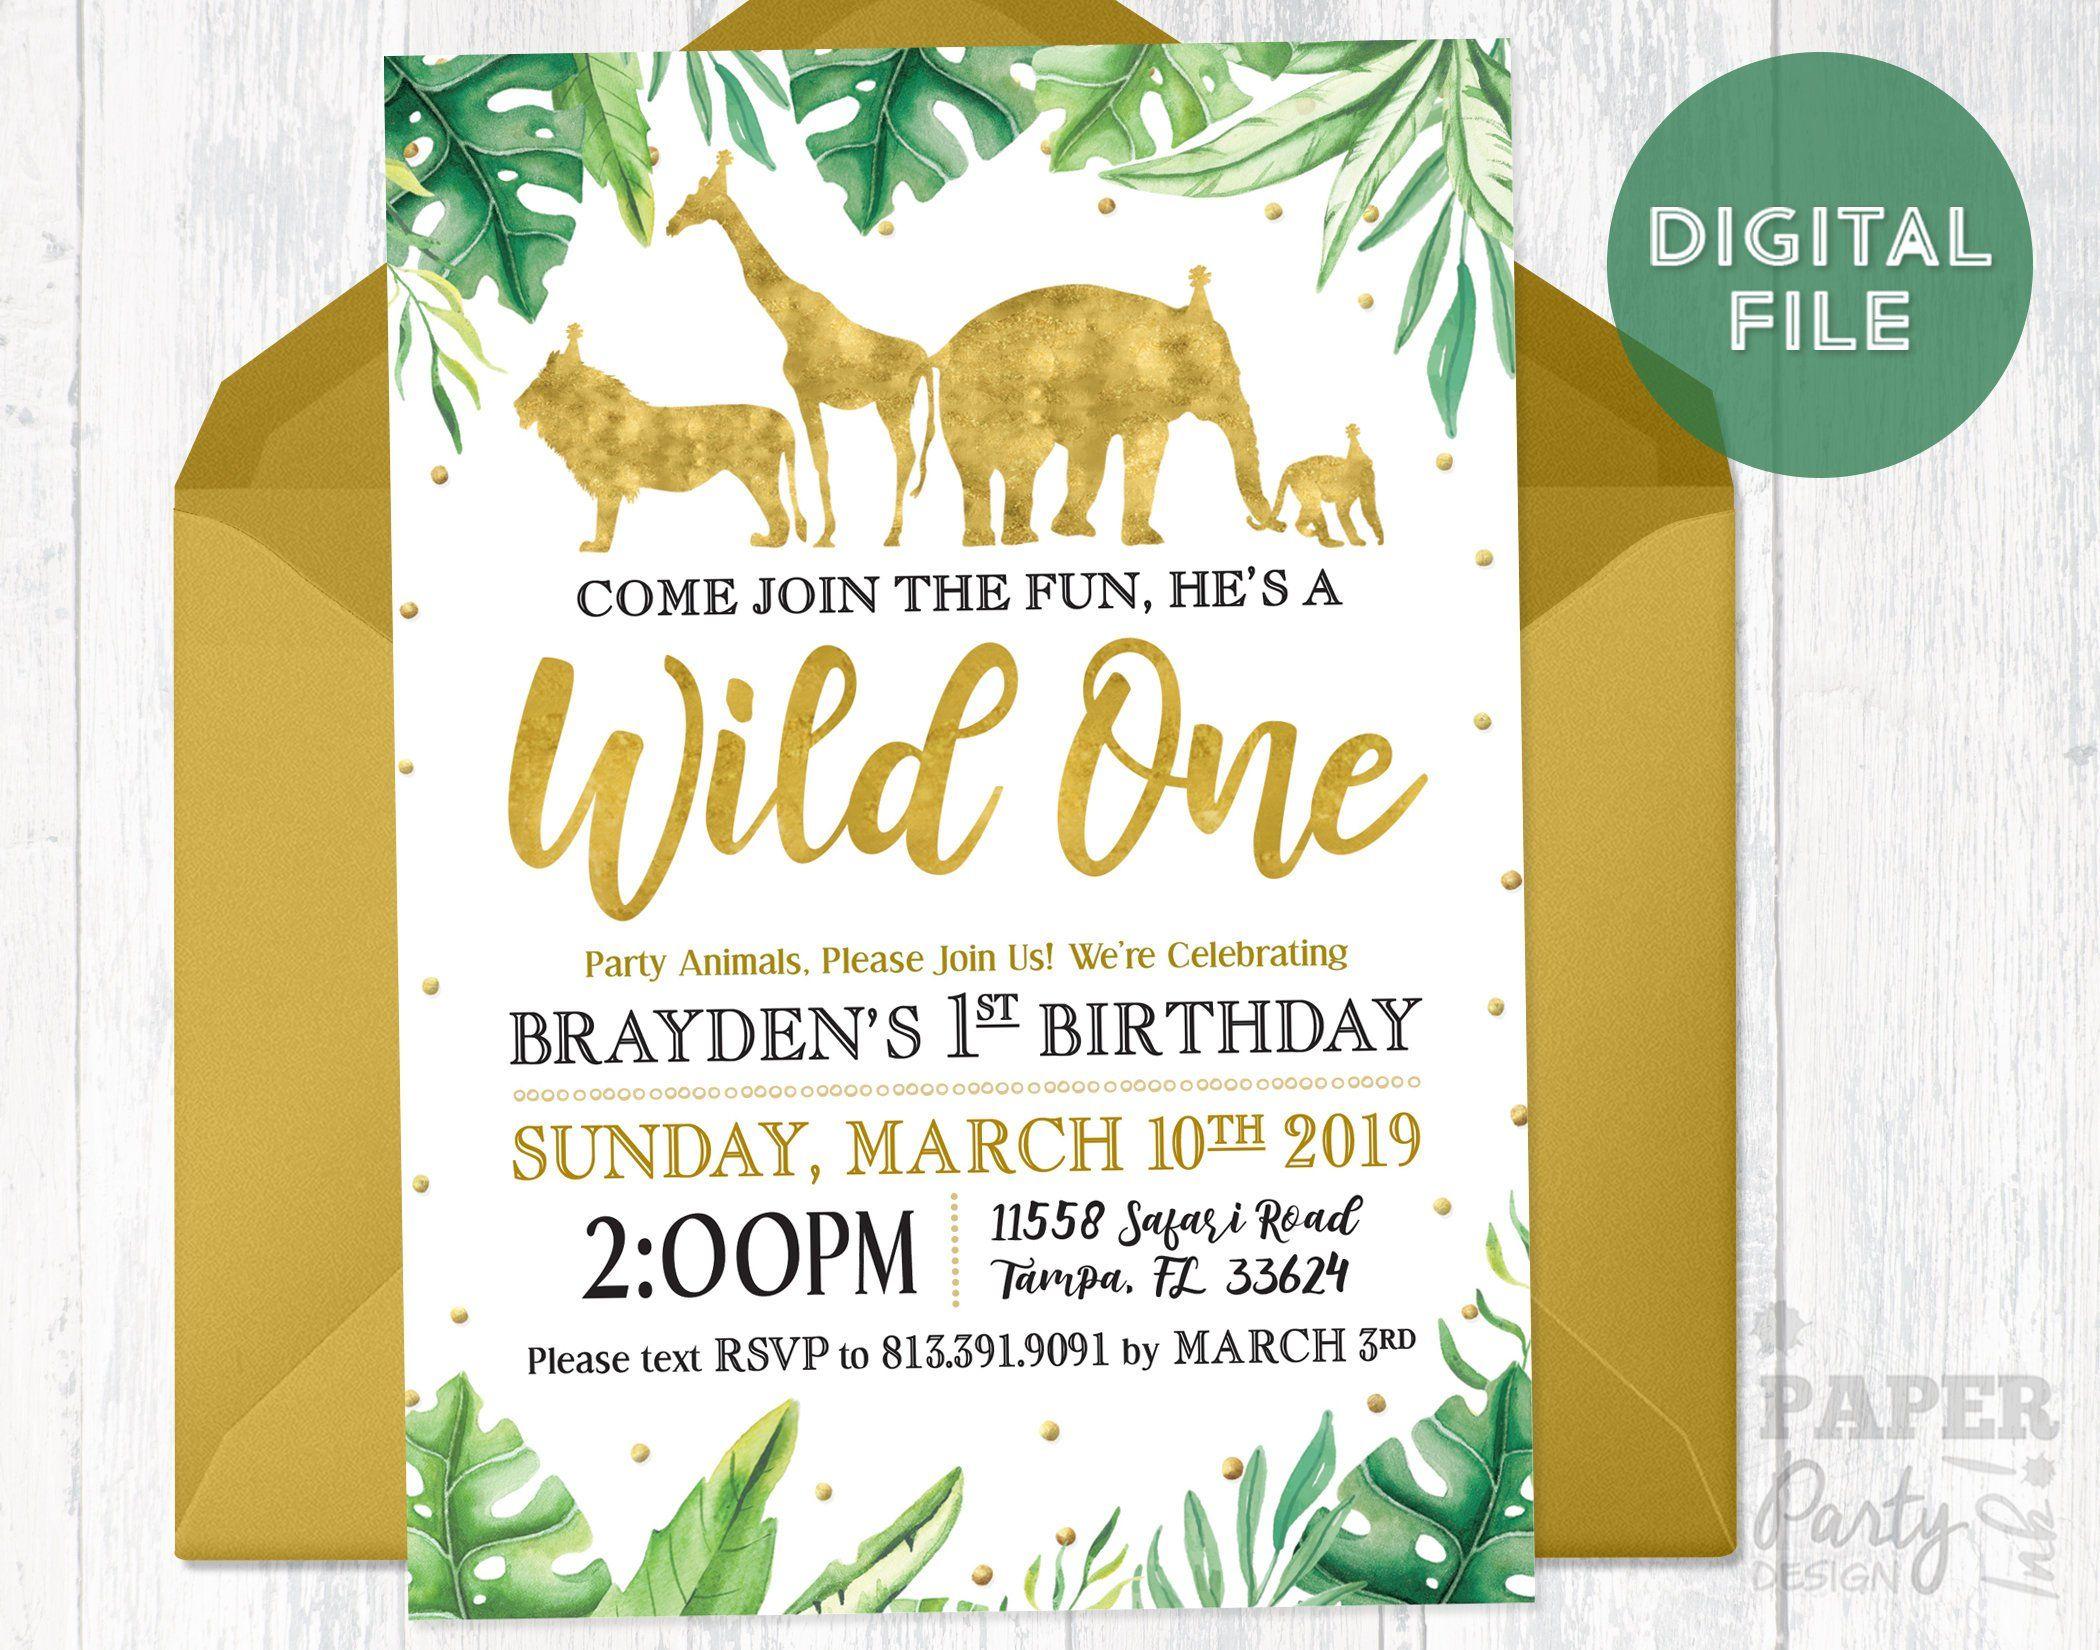 First Birthday Wild One Invitation Birthday Invitation Wild One Digital Invitation Jungle Invitation